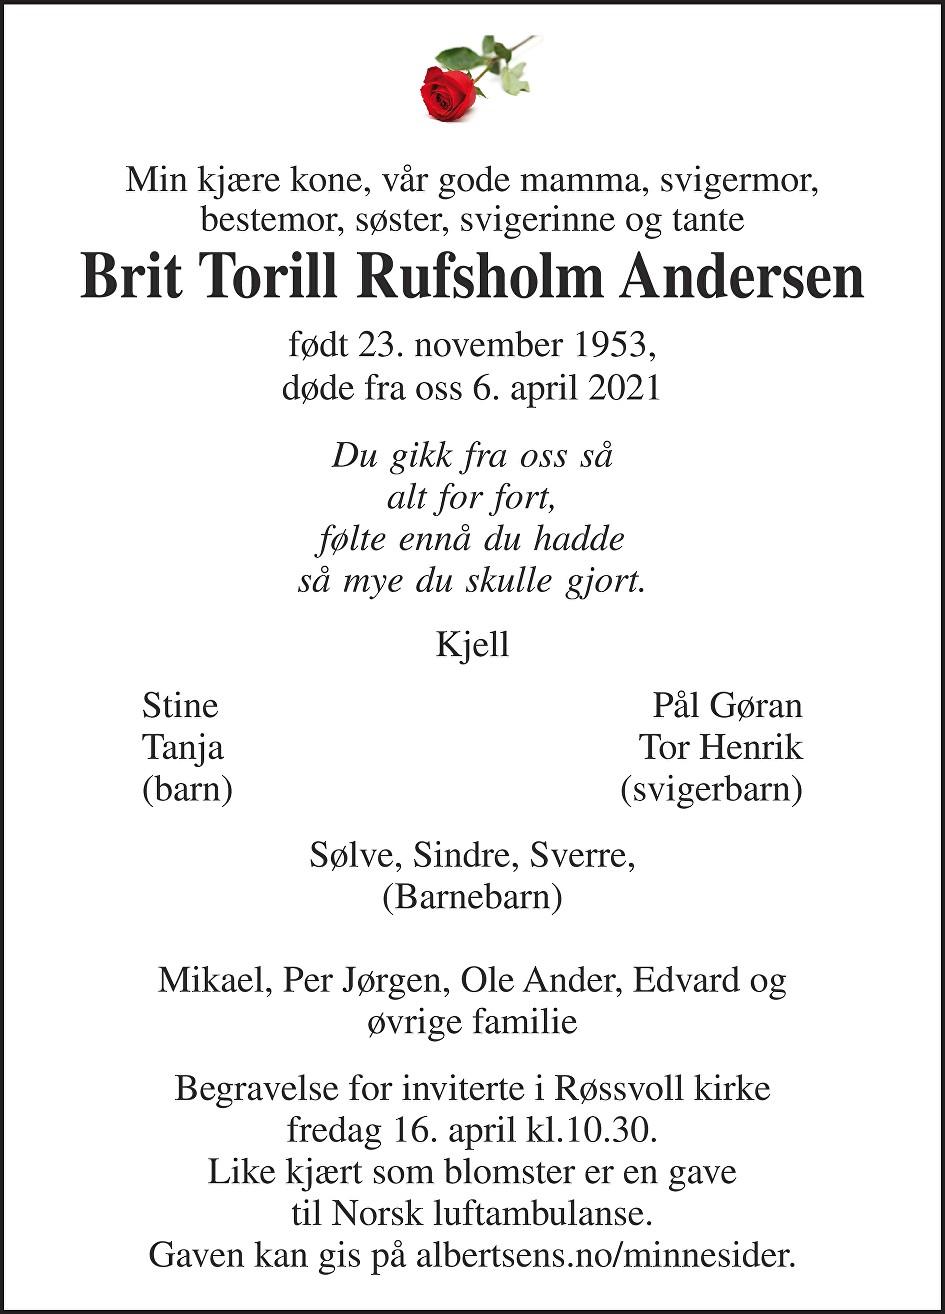 Brit Torill Rufsholm Andersen Dødsannonse